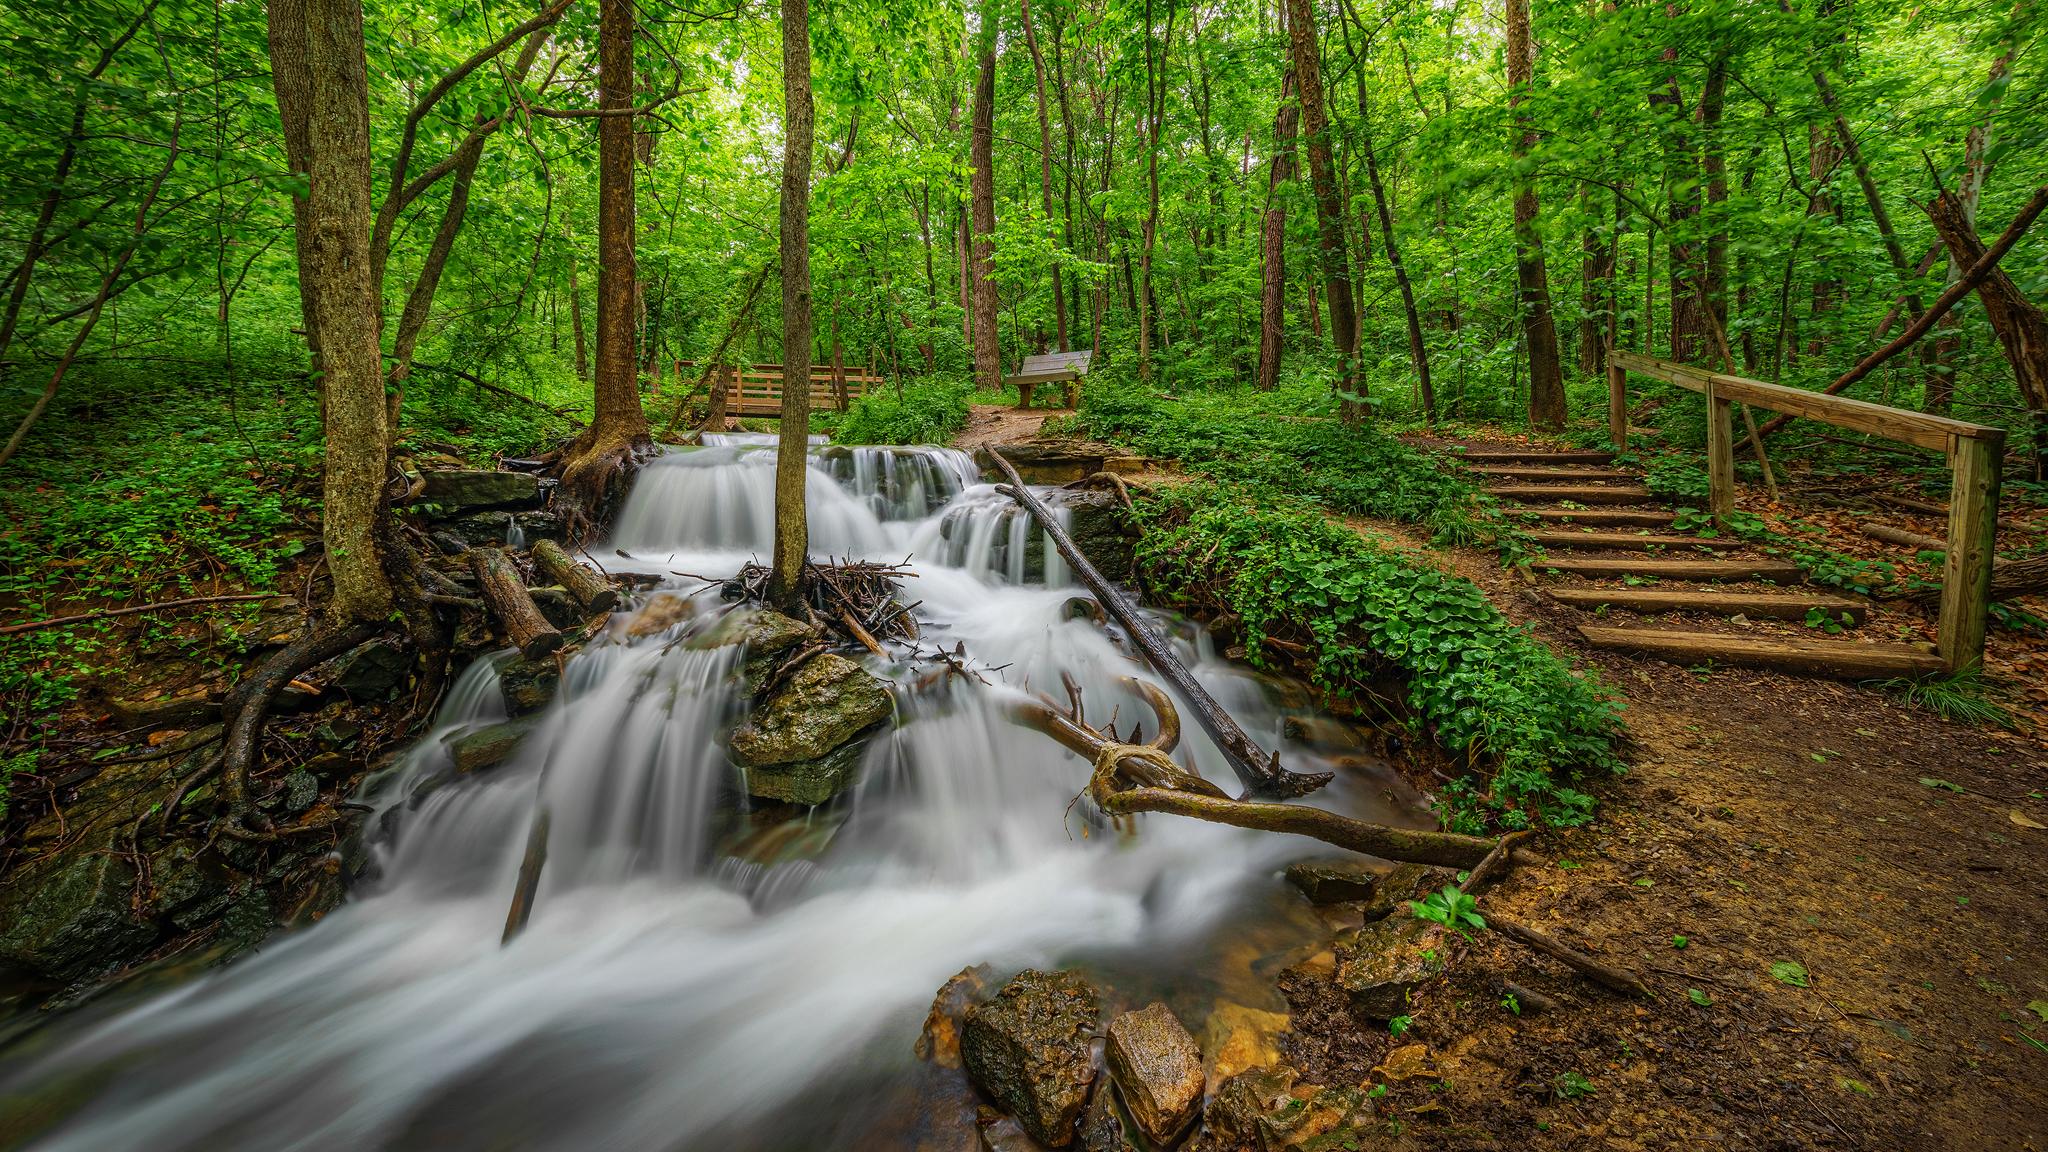 природа река водопад лес деревья nature river waterfall forest trees  № 484120  скачать